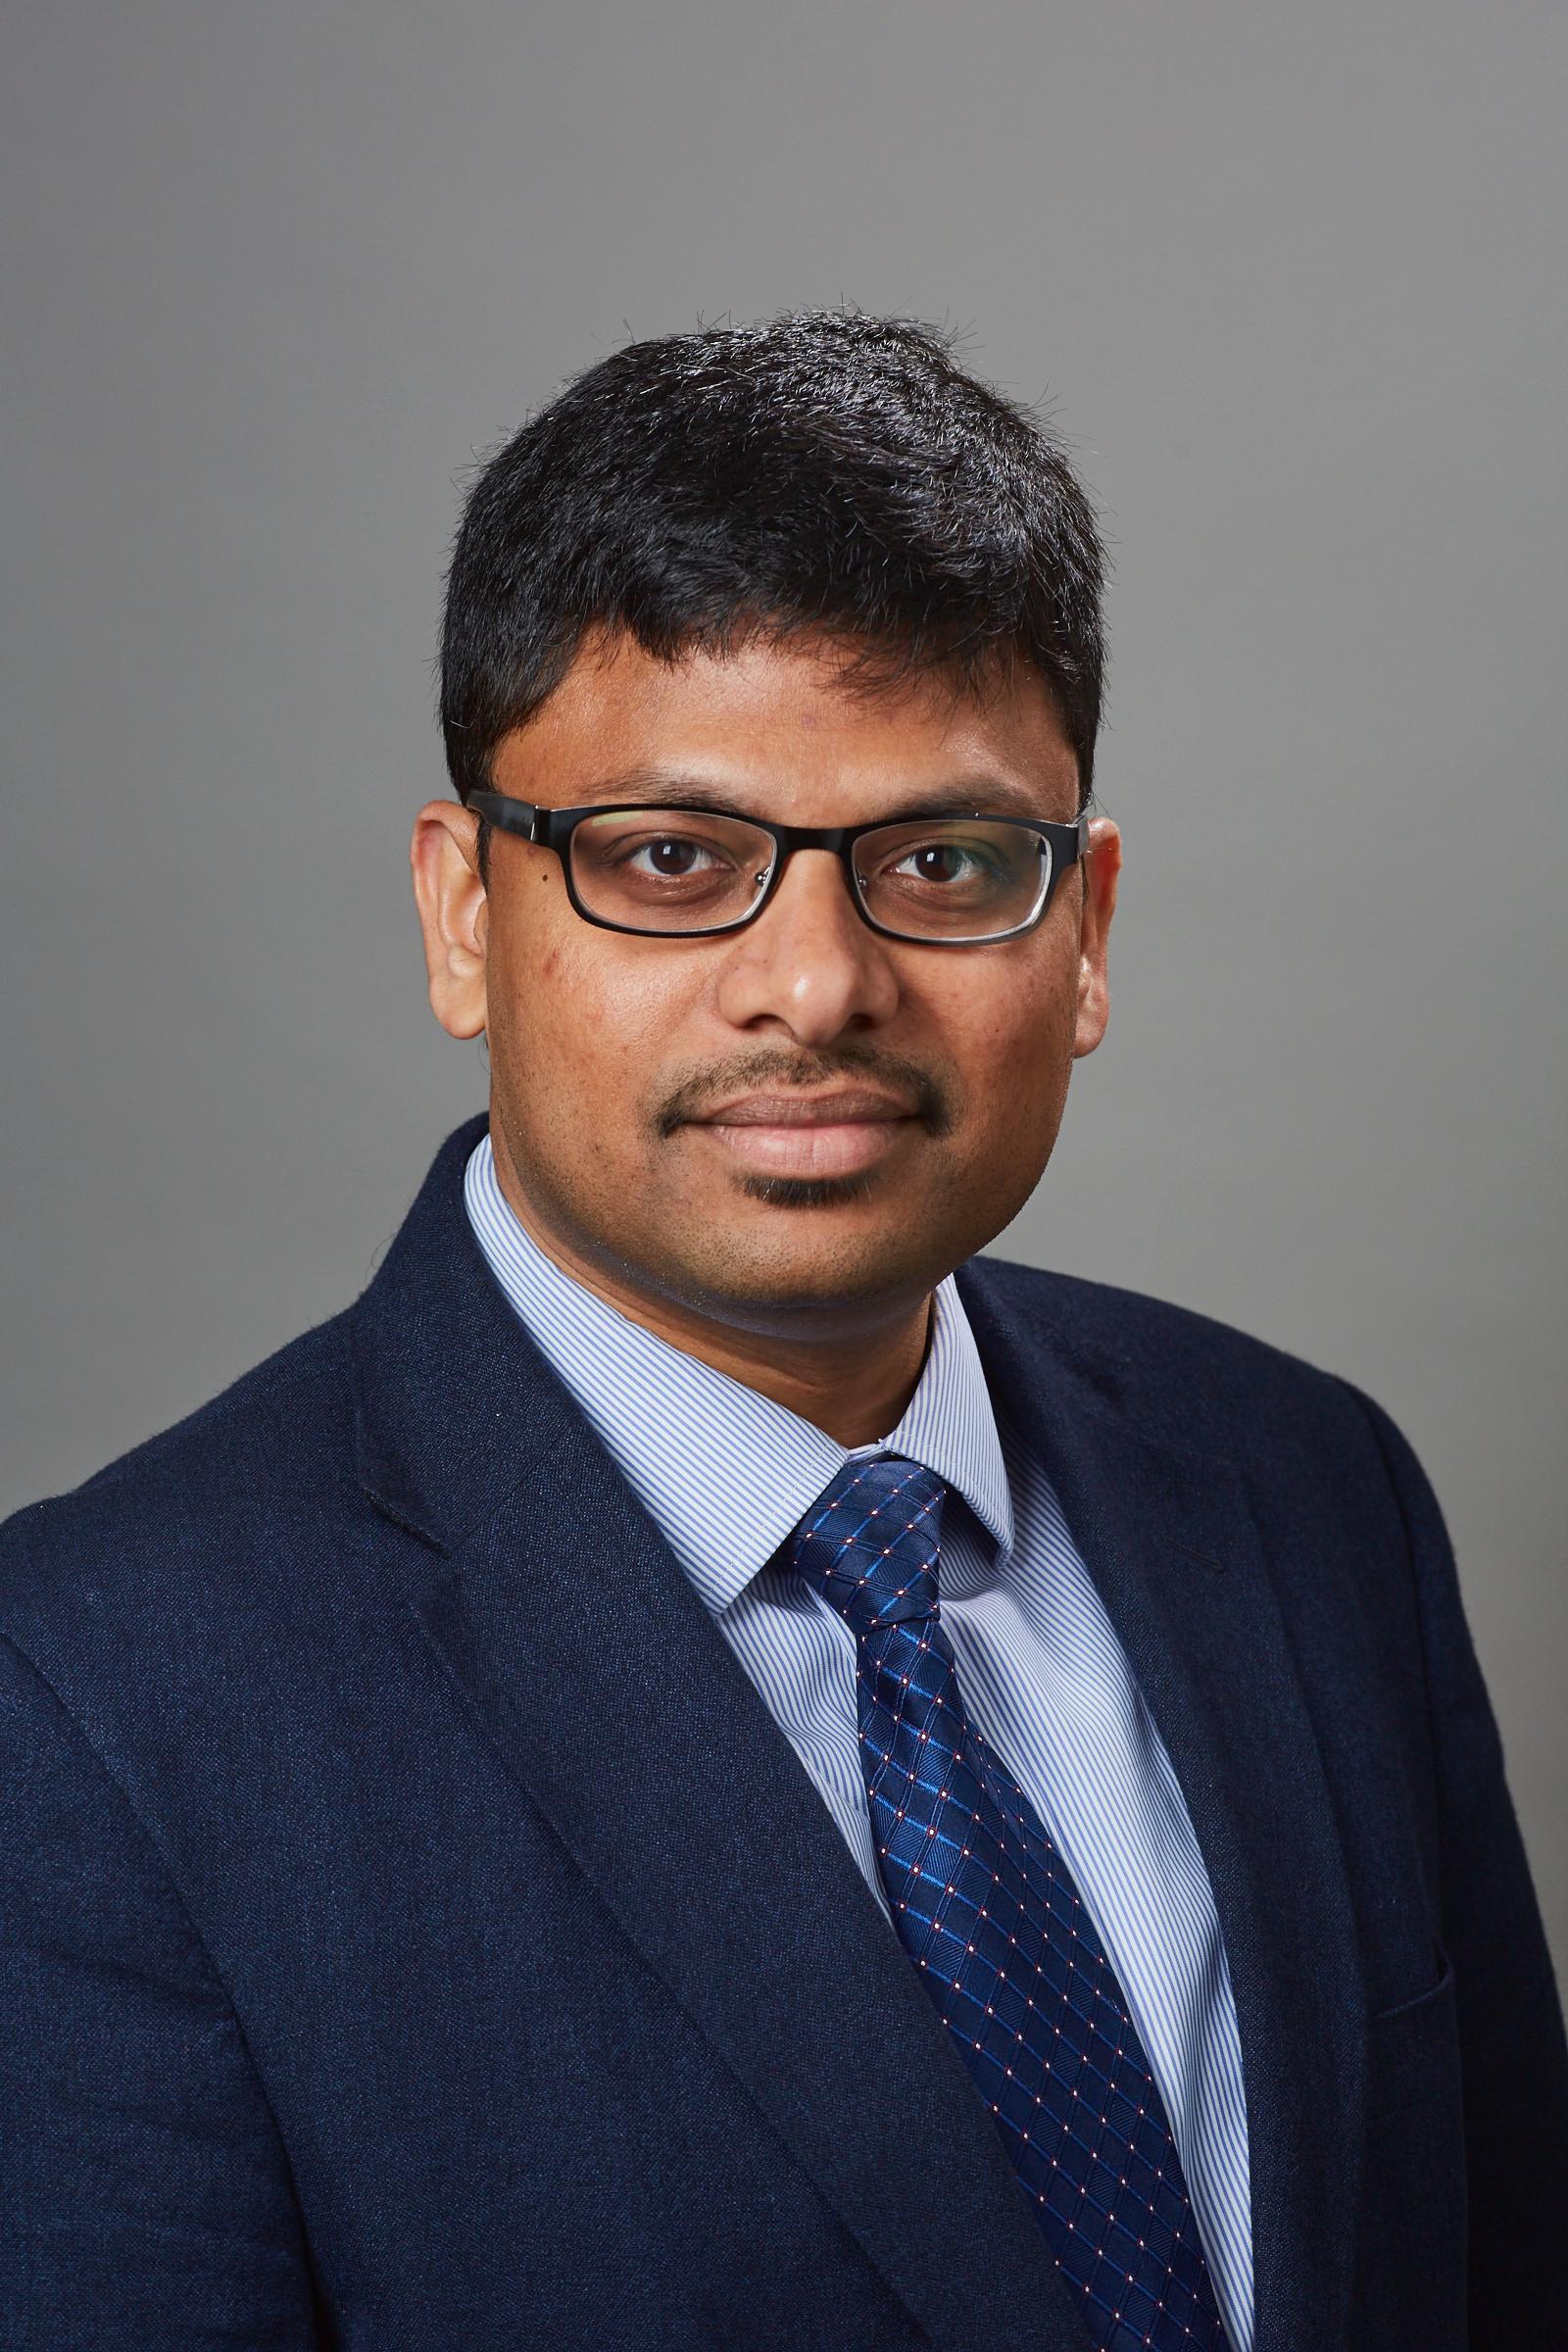 Dr. Srinivas B Muvvala, MD, MPH